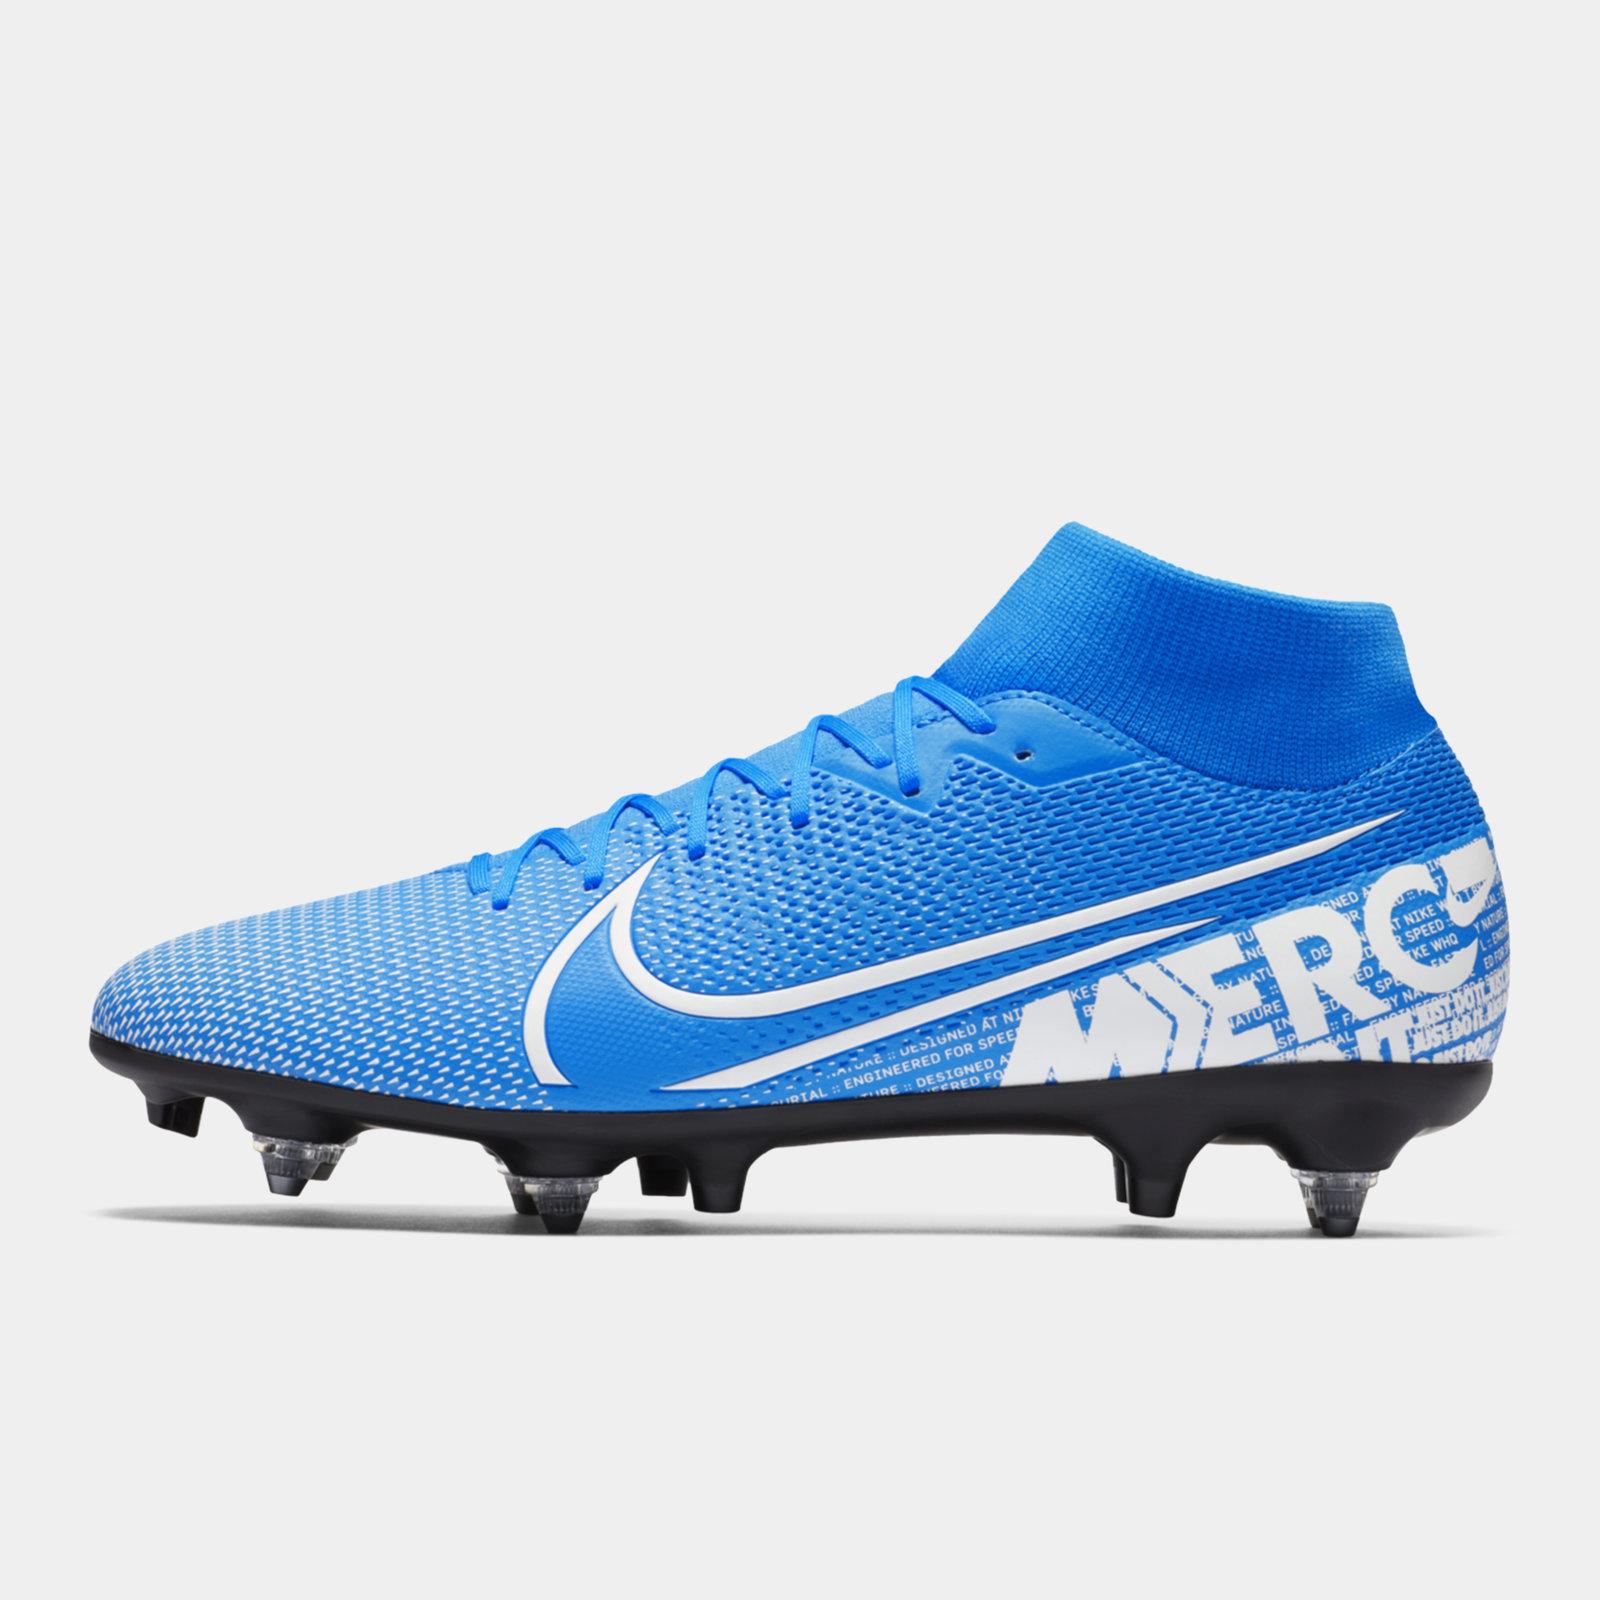 Mercurial Superfly Academy DF SG Football Boots